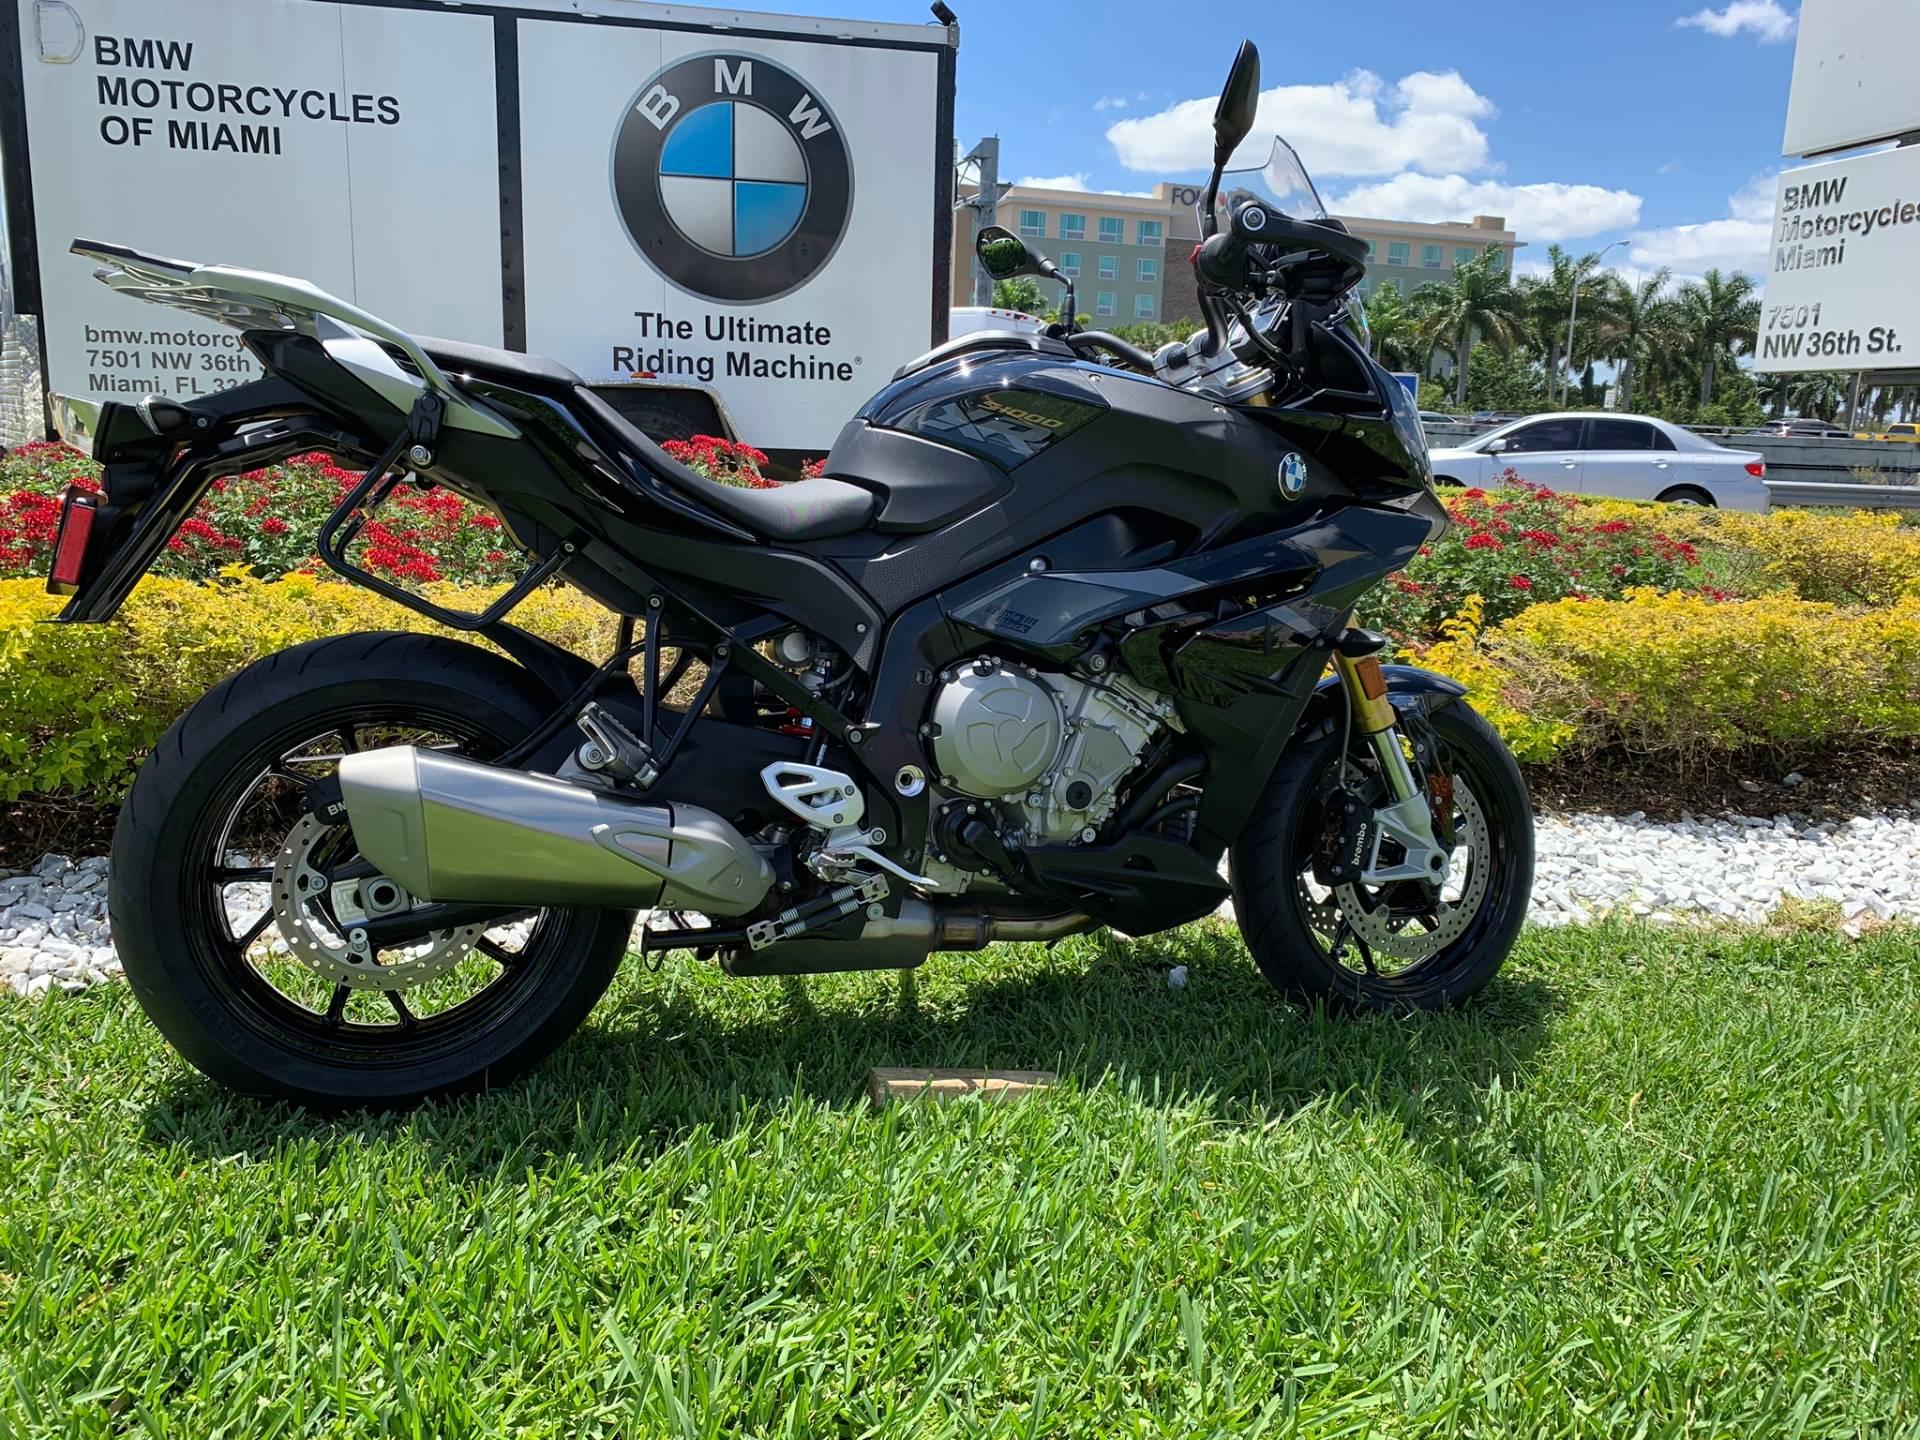 New 2019 Bmw S 1000 Xr Motorcycles In Miami Fl